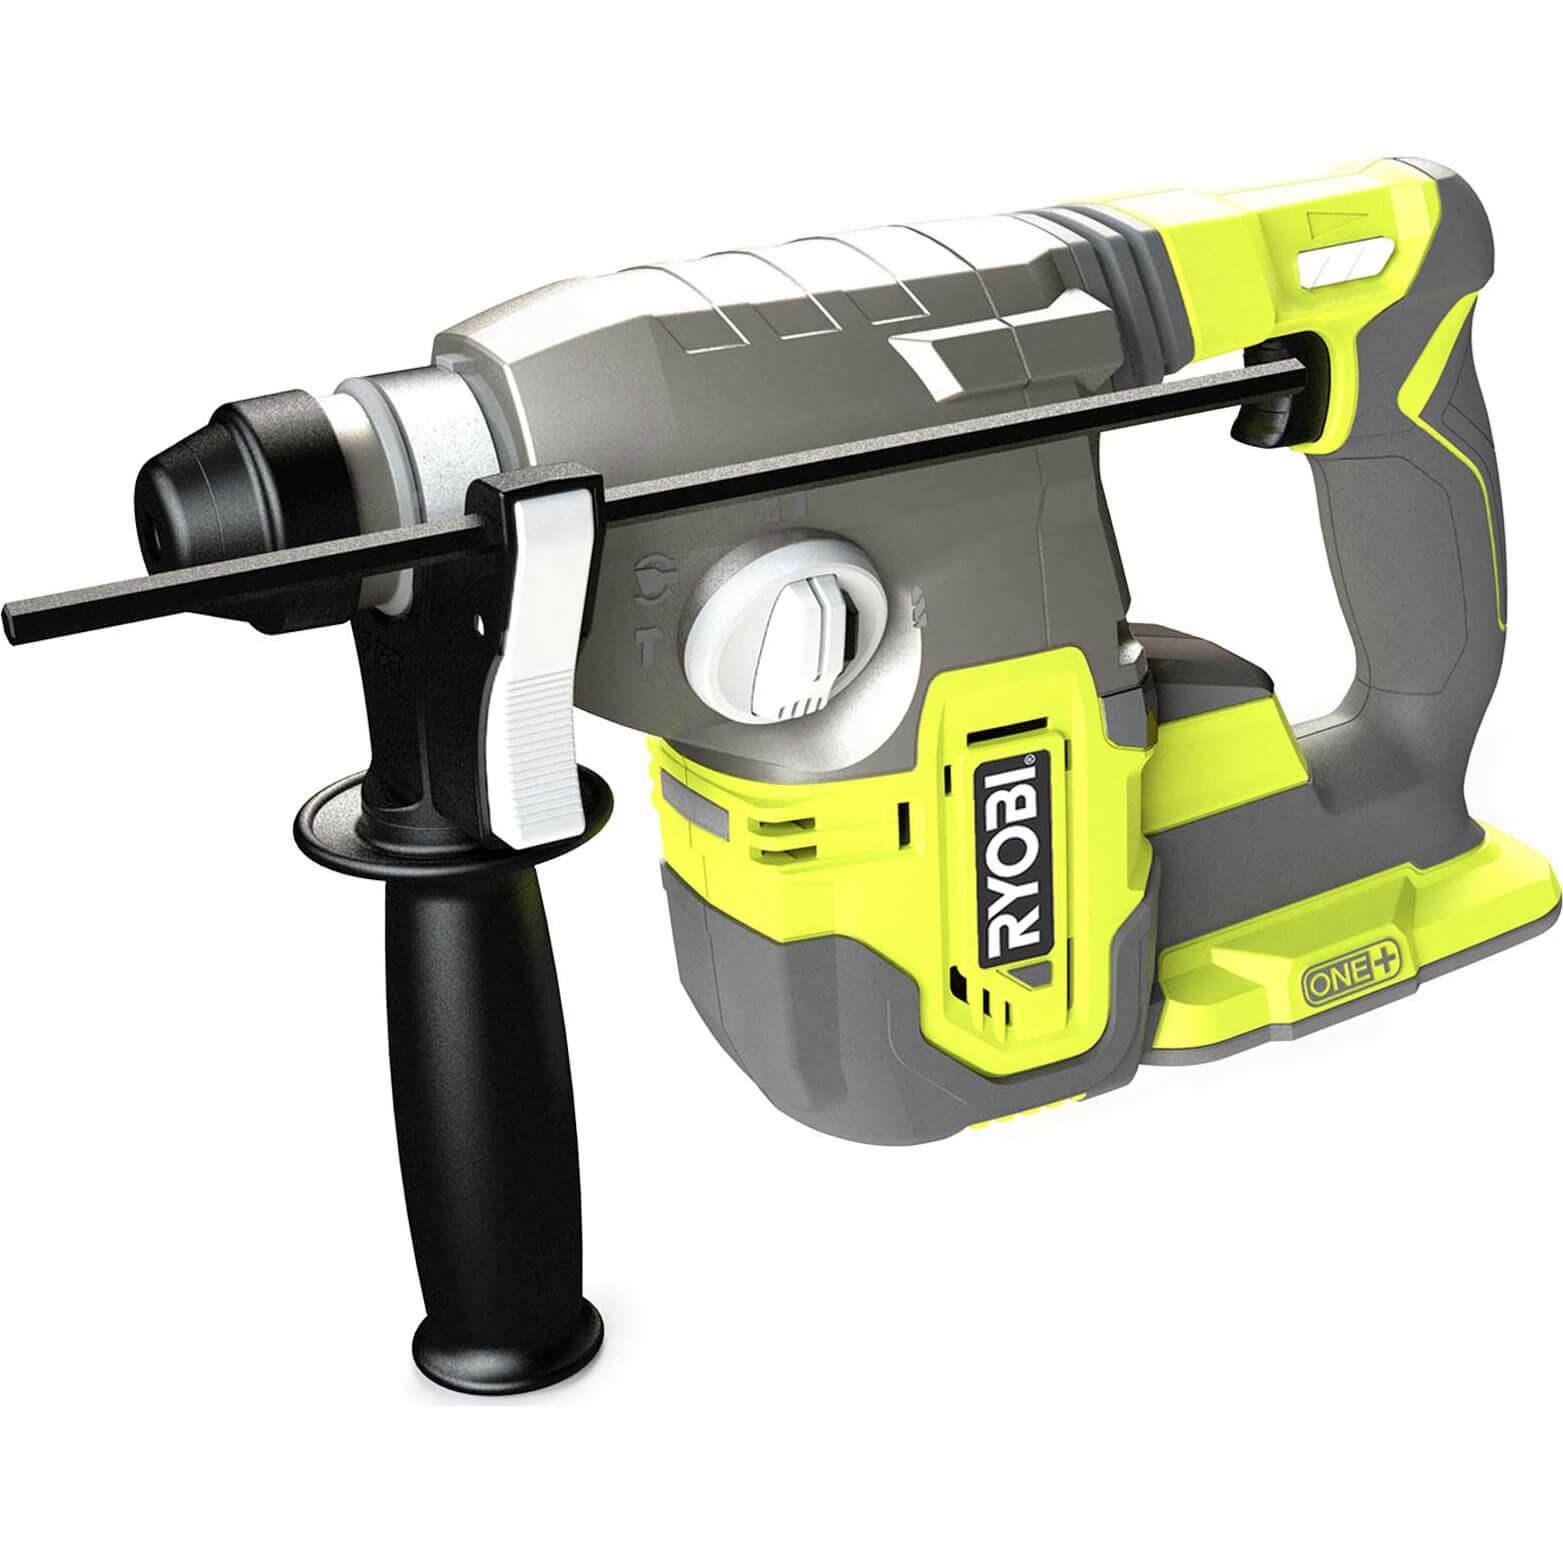 Ryobi R18sds7 One 18v Cordless Brushless Sds Plus Drill Sds Drills